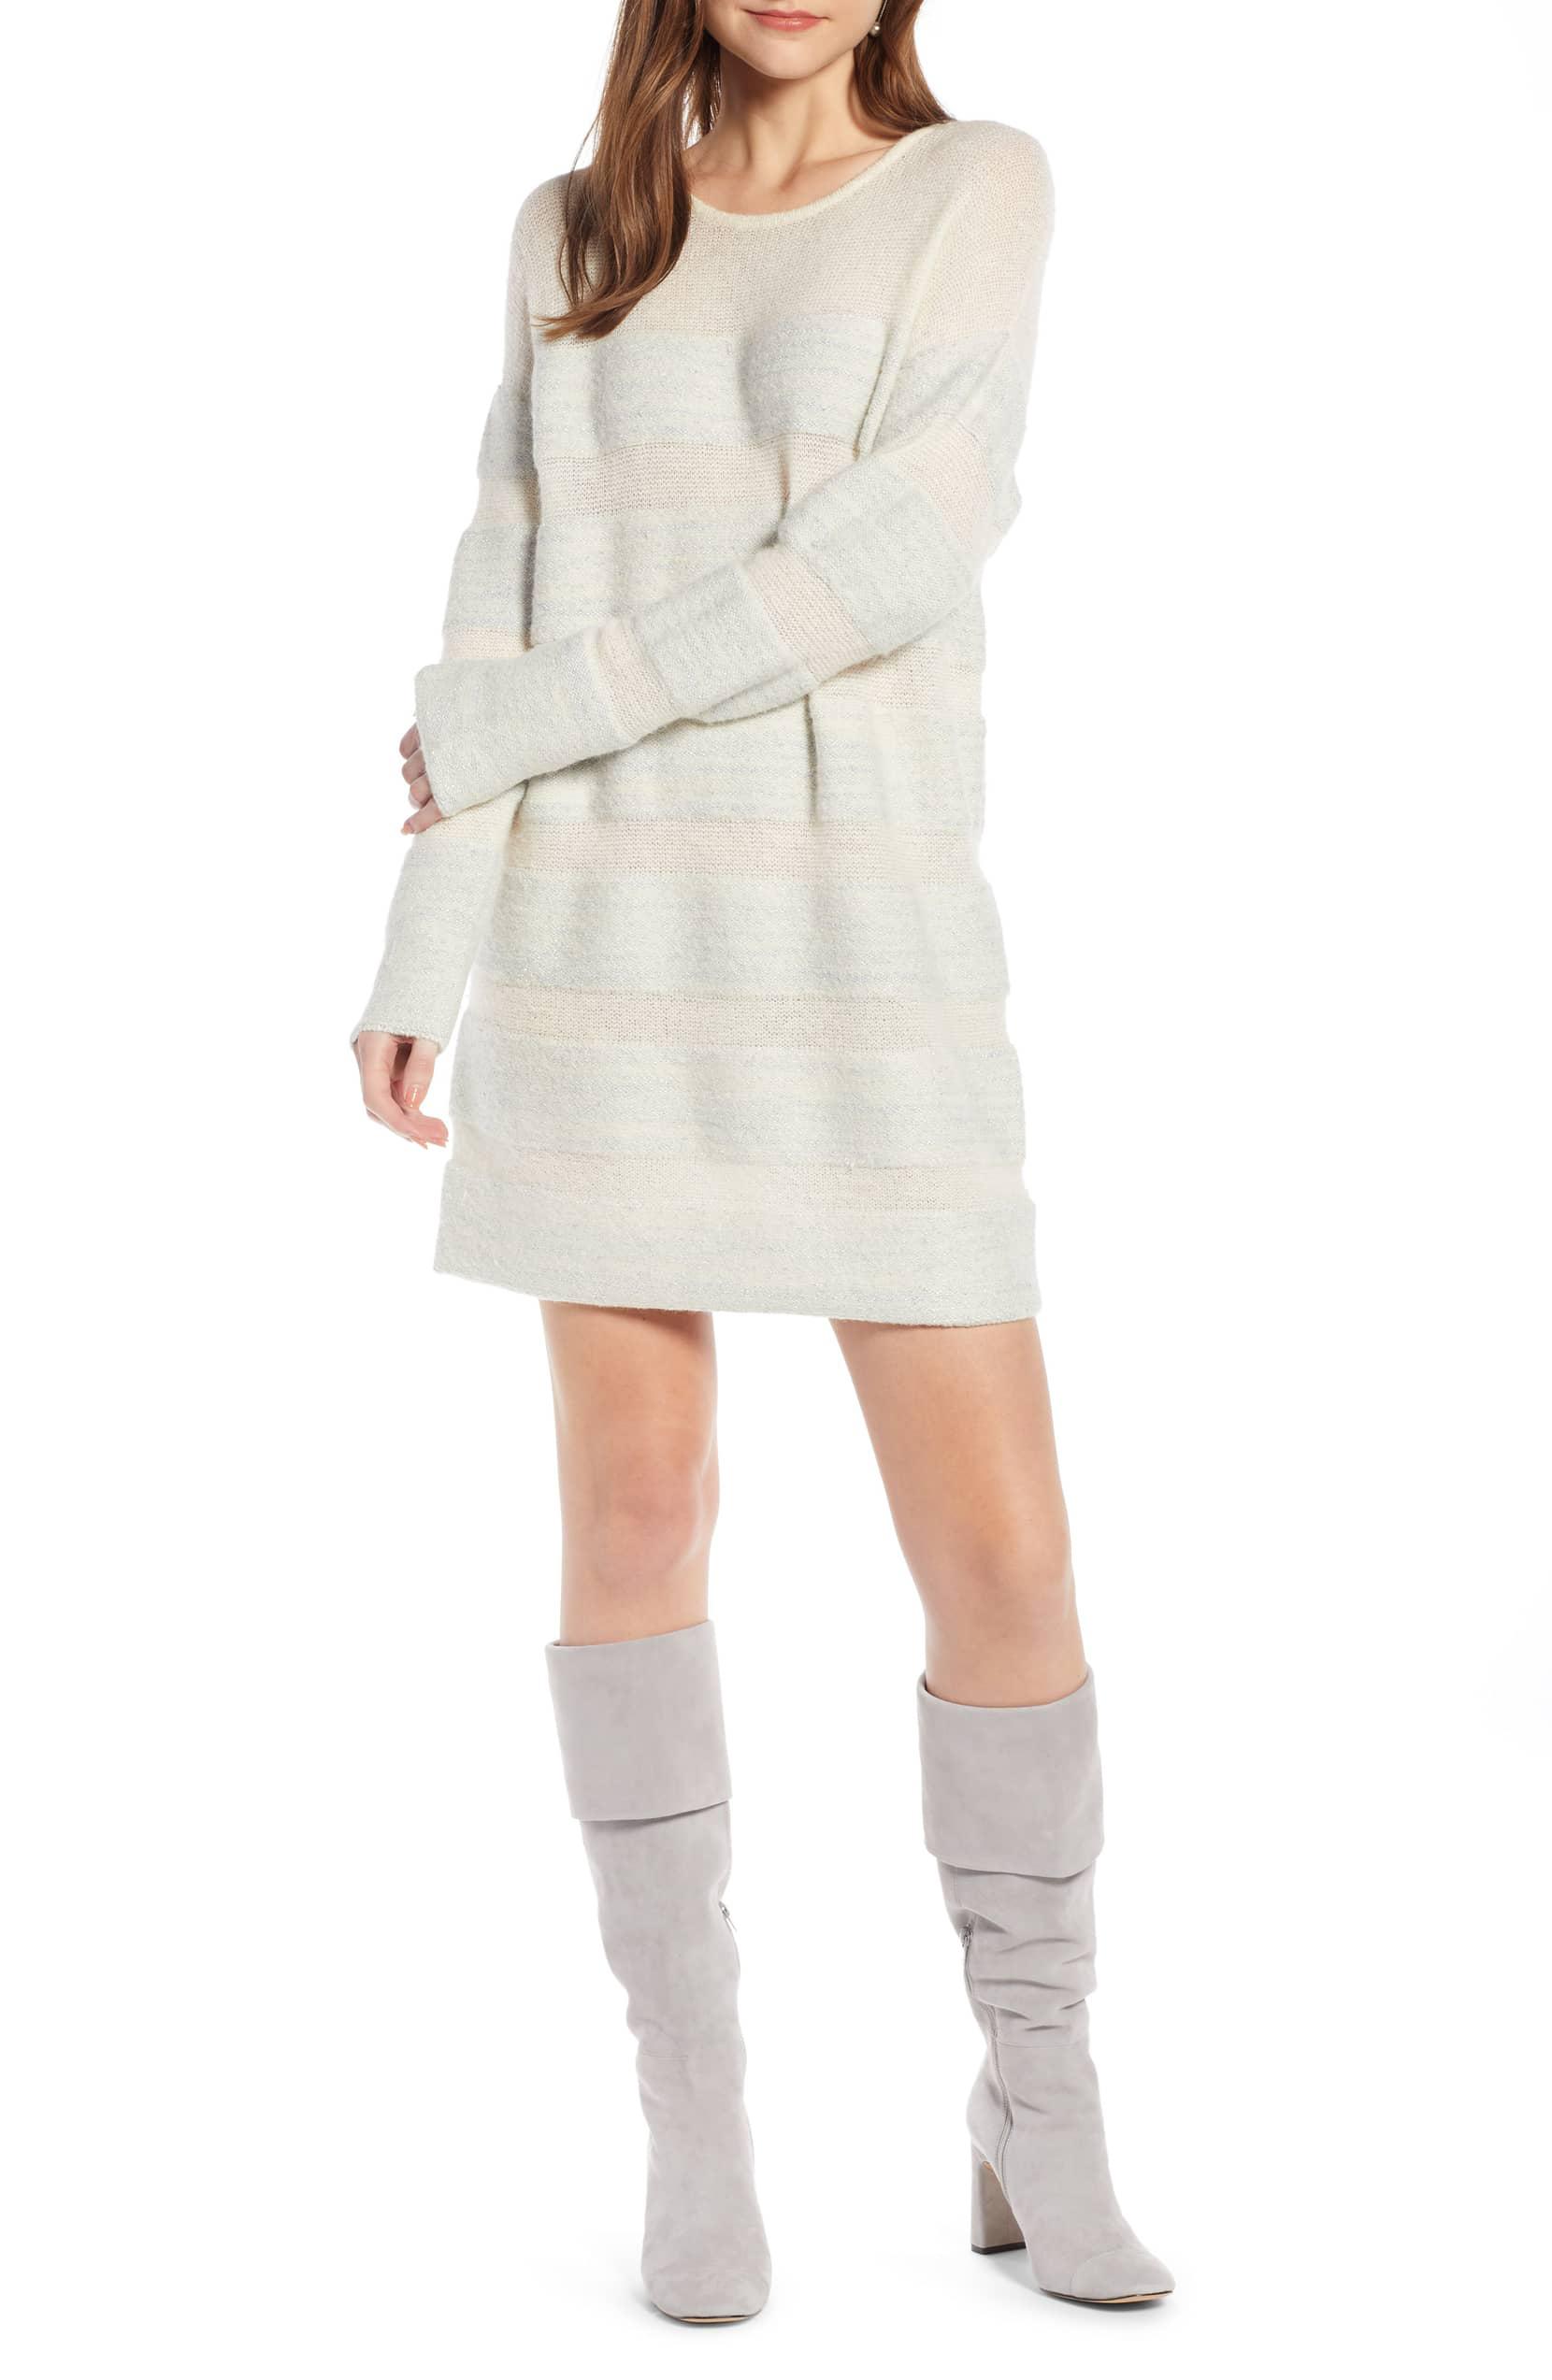 sweaterdress